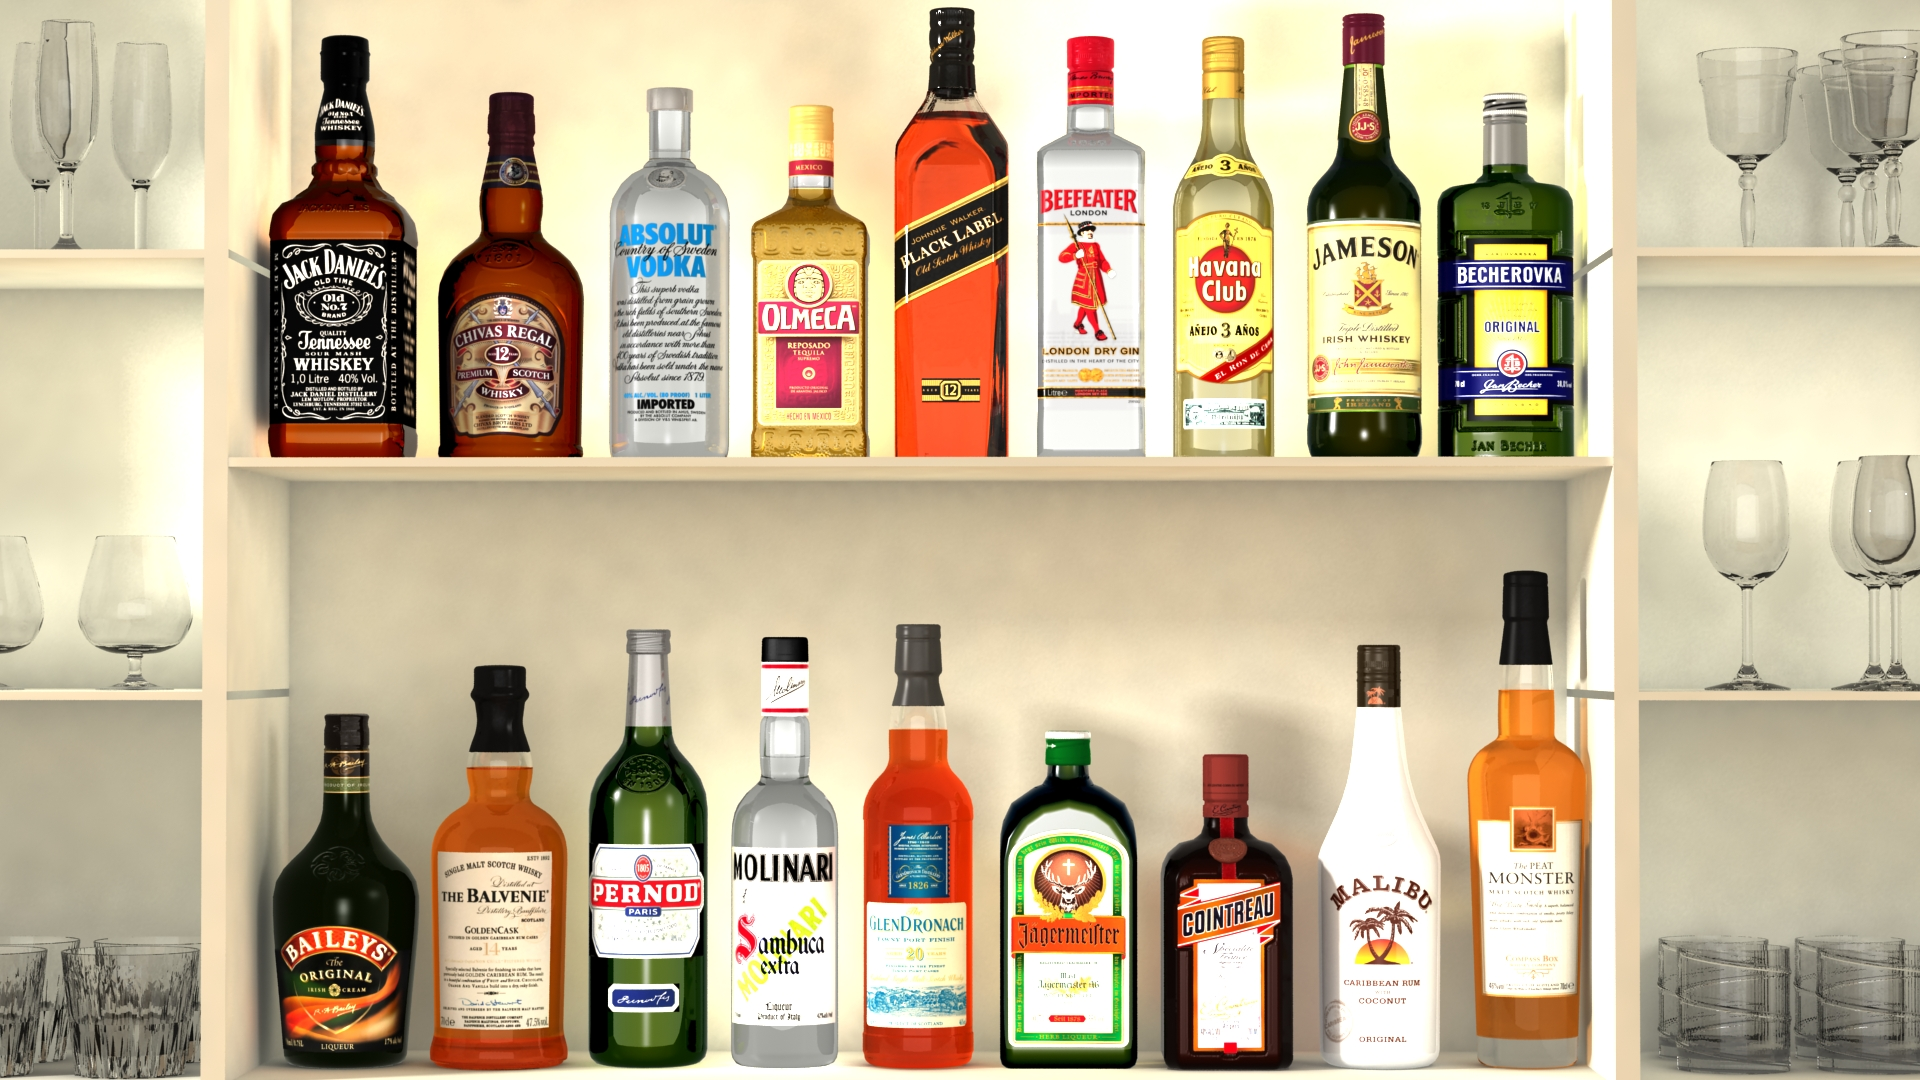 liquor bottles with bar unit interior vr/ar ready 3d model 3ds max  fbx jpeg jpg texture obj 279238